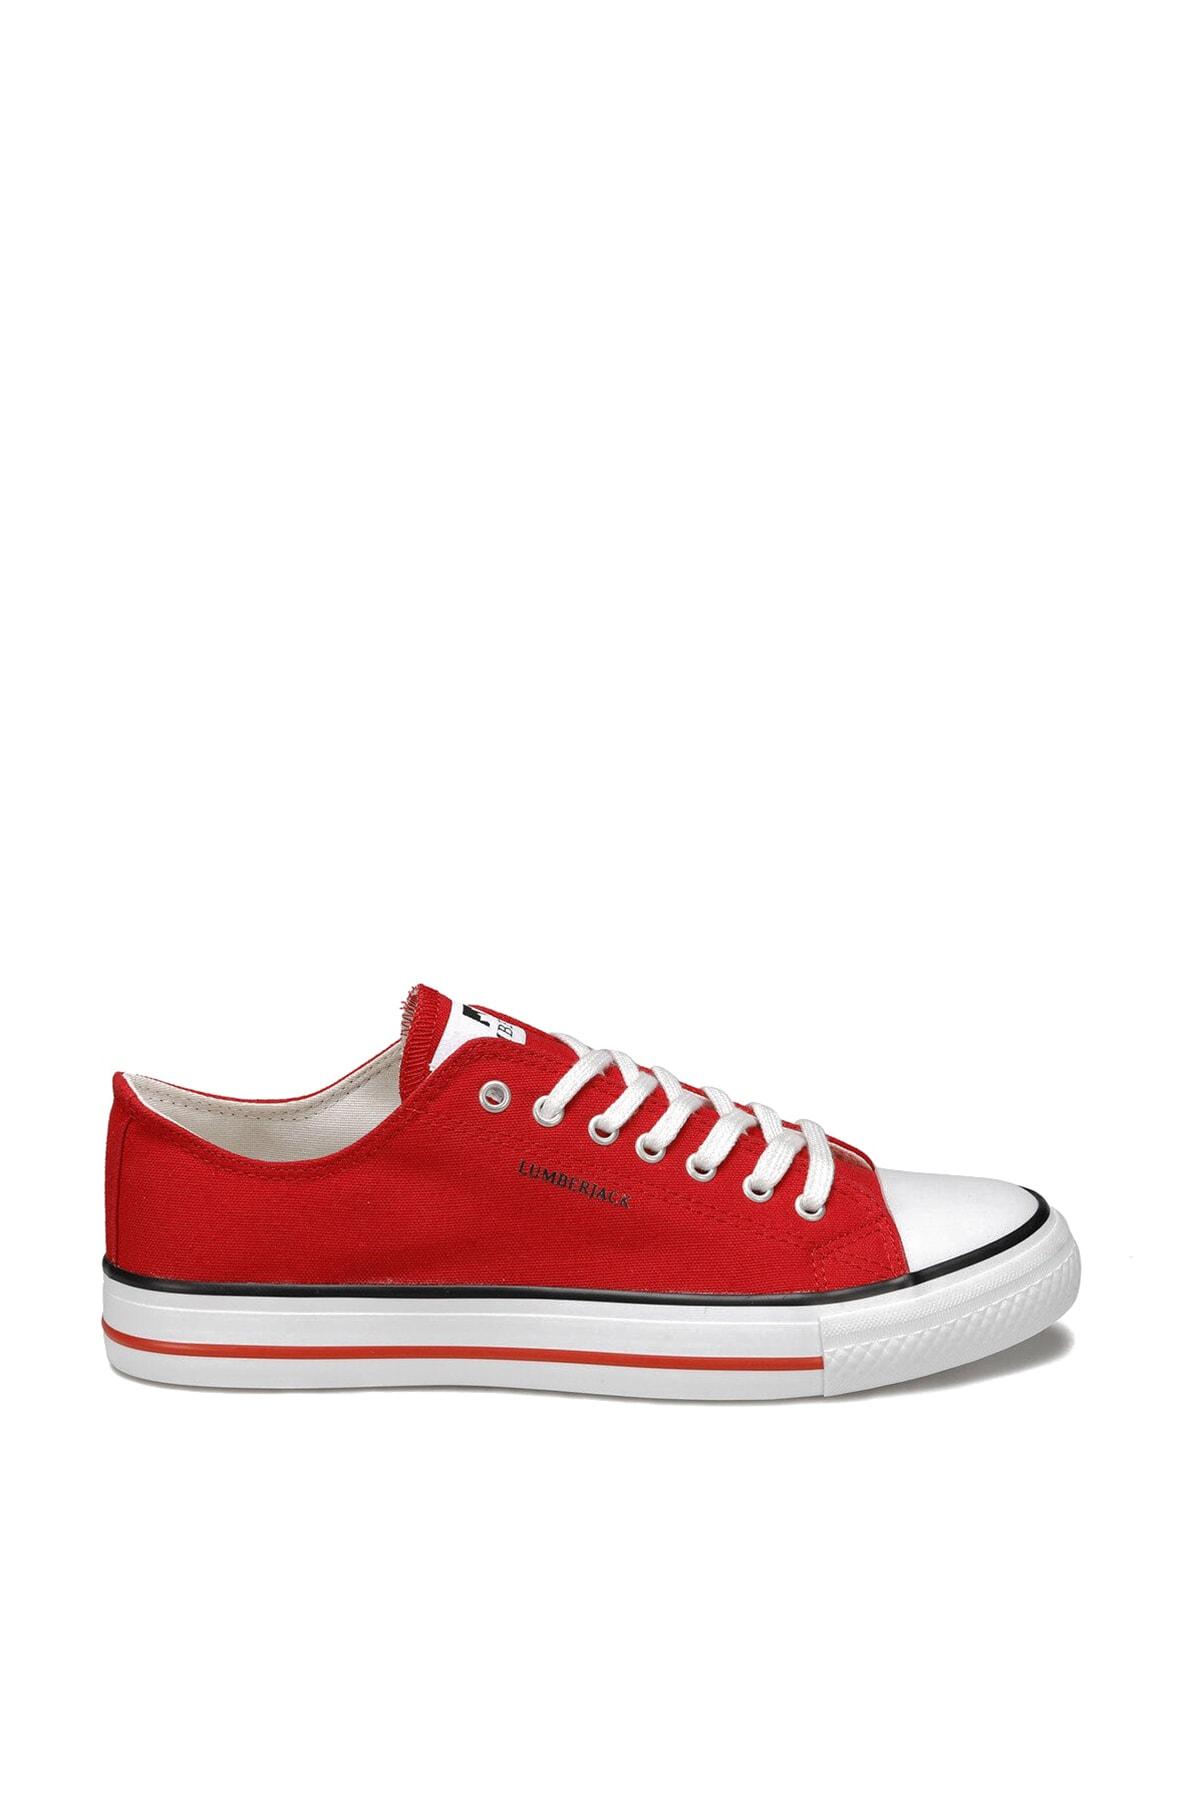 lumberjack Erkek Ayakkabı Maxwell 100506841 2